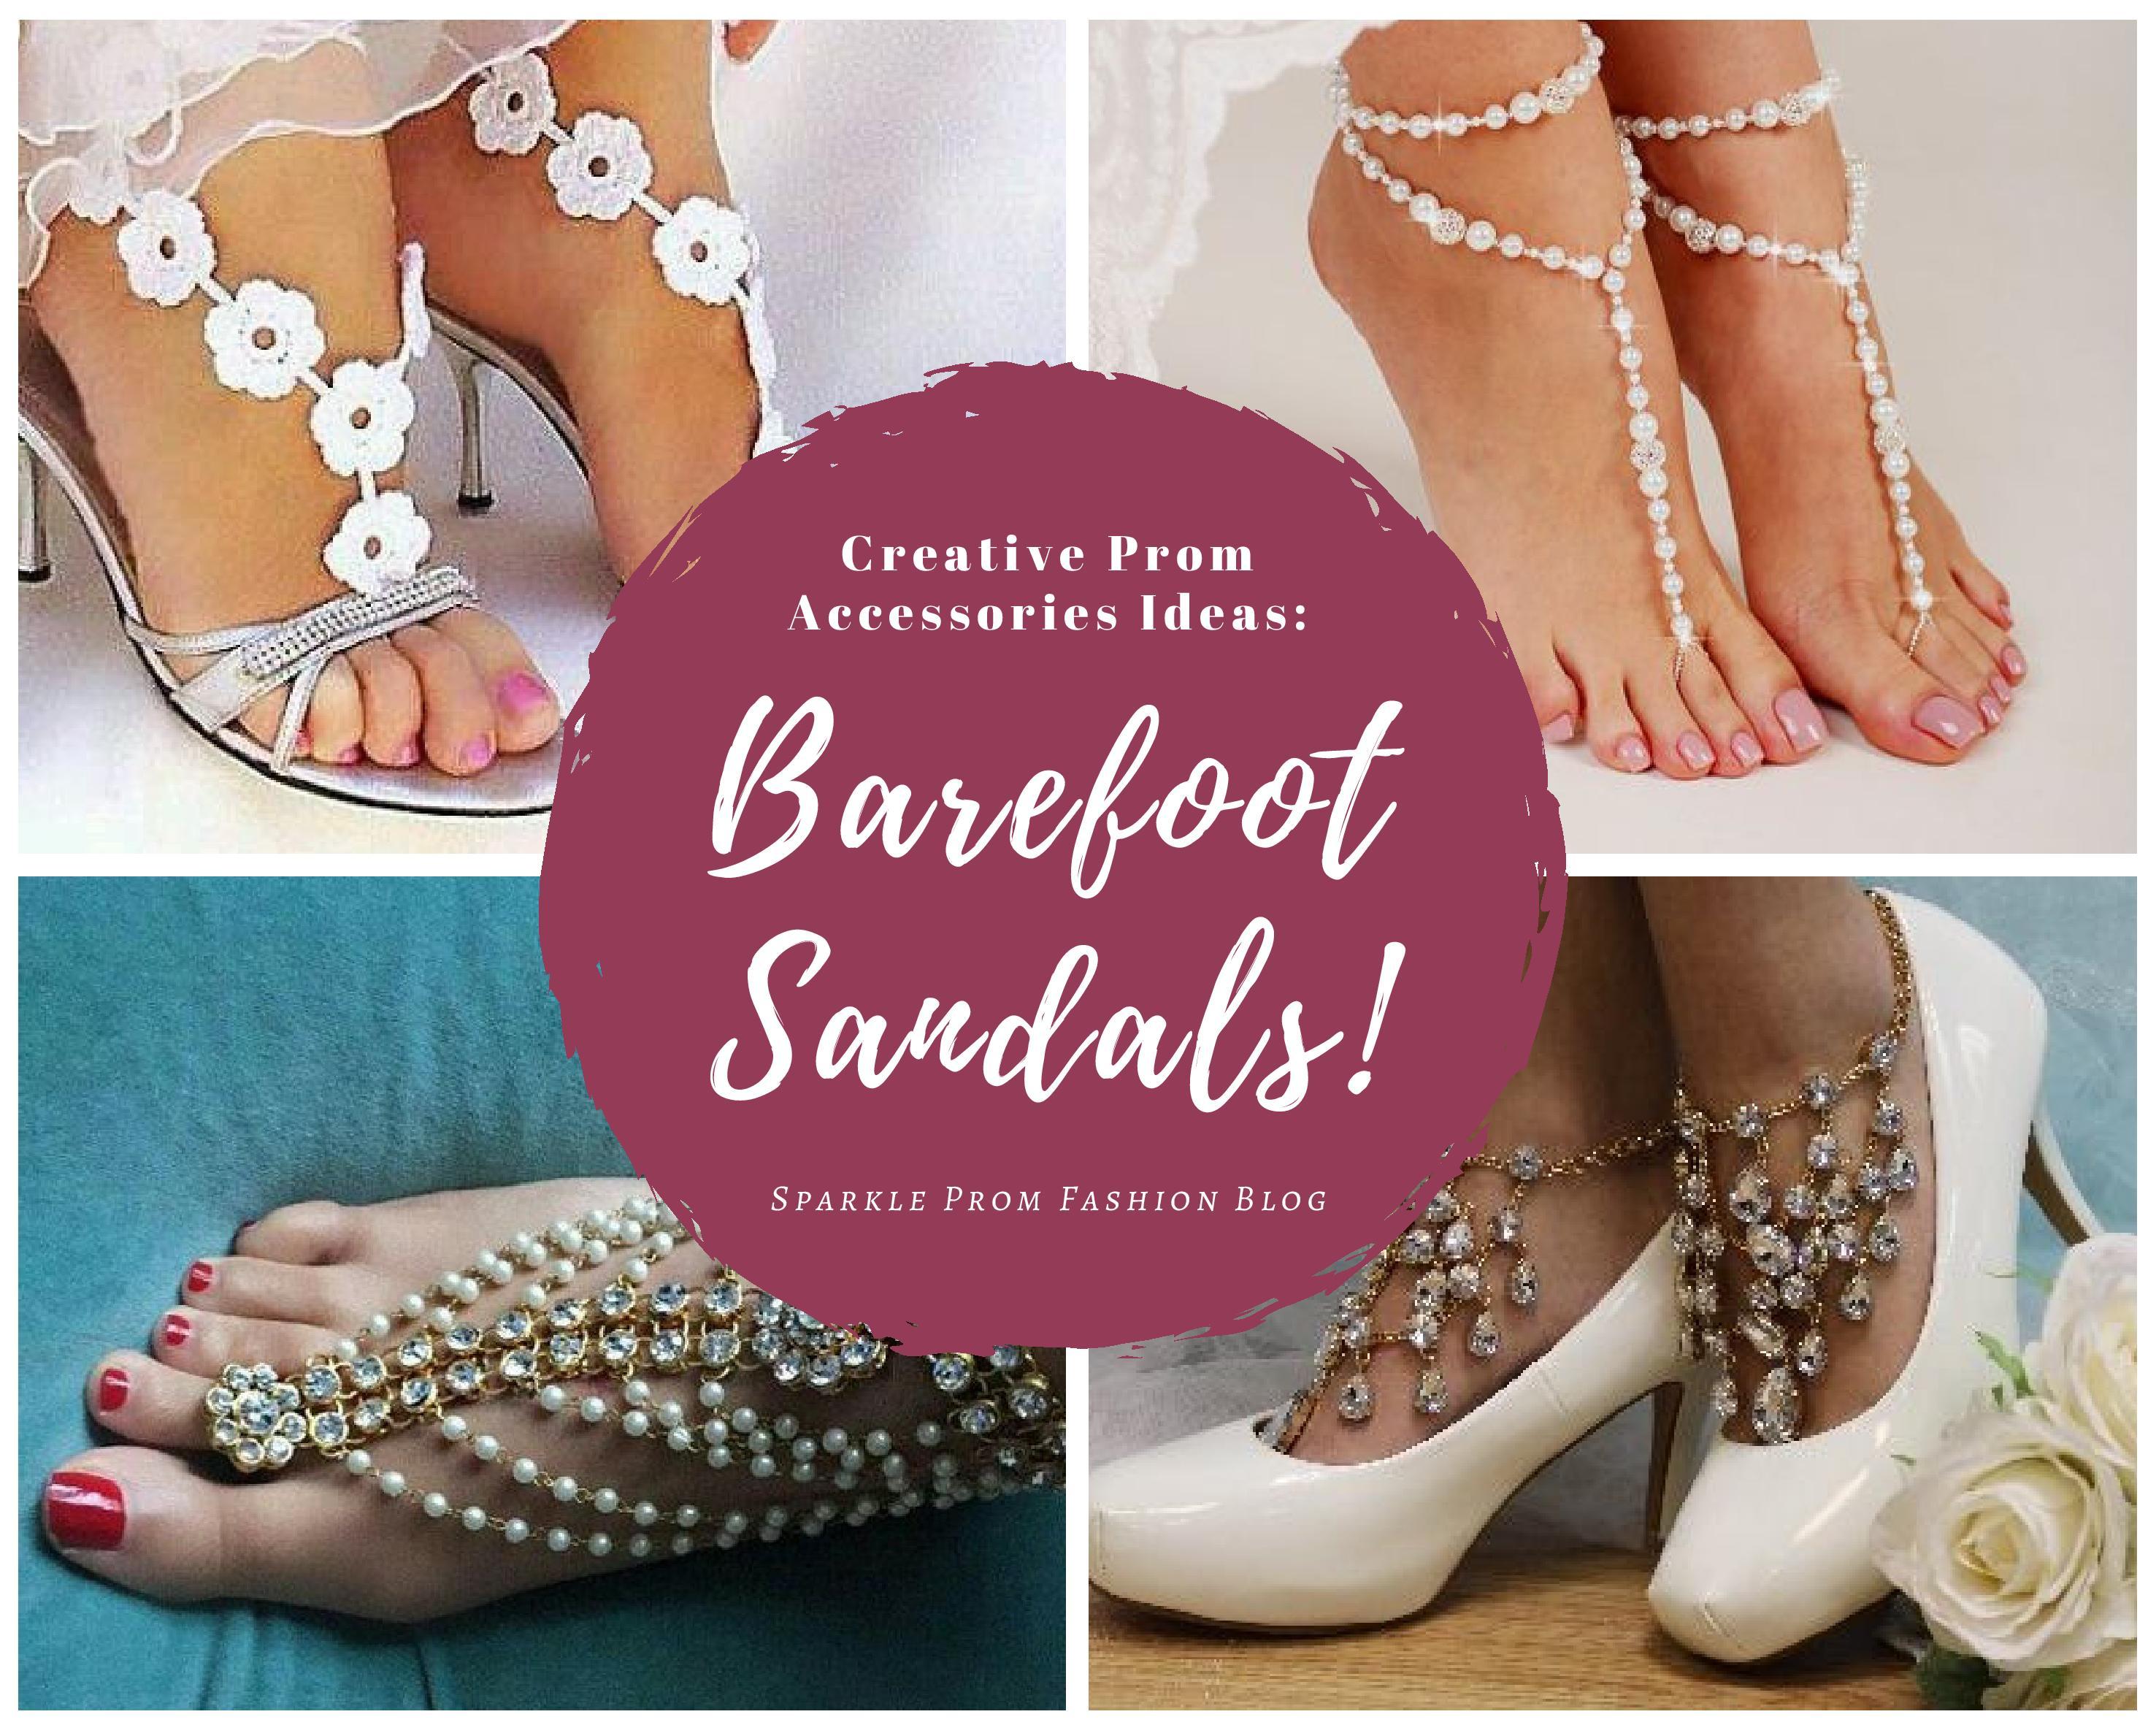 Best Prom Accessories Ideas: Barefoot Sandals! – Sparkle Prom Fashion Blog